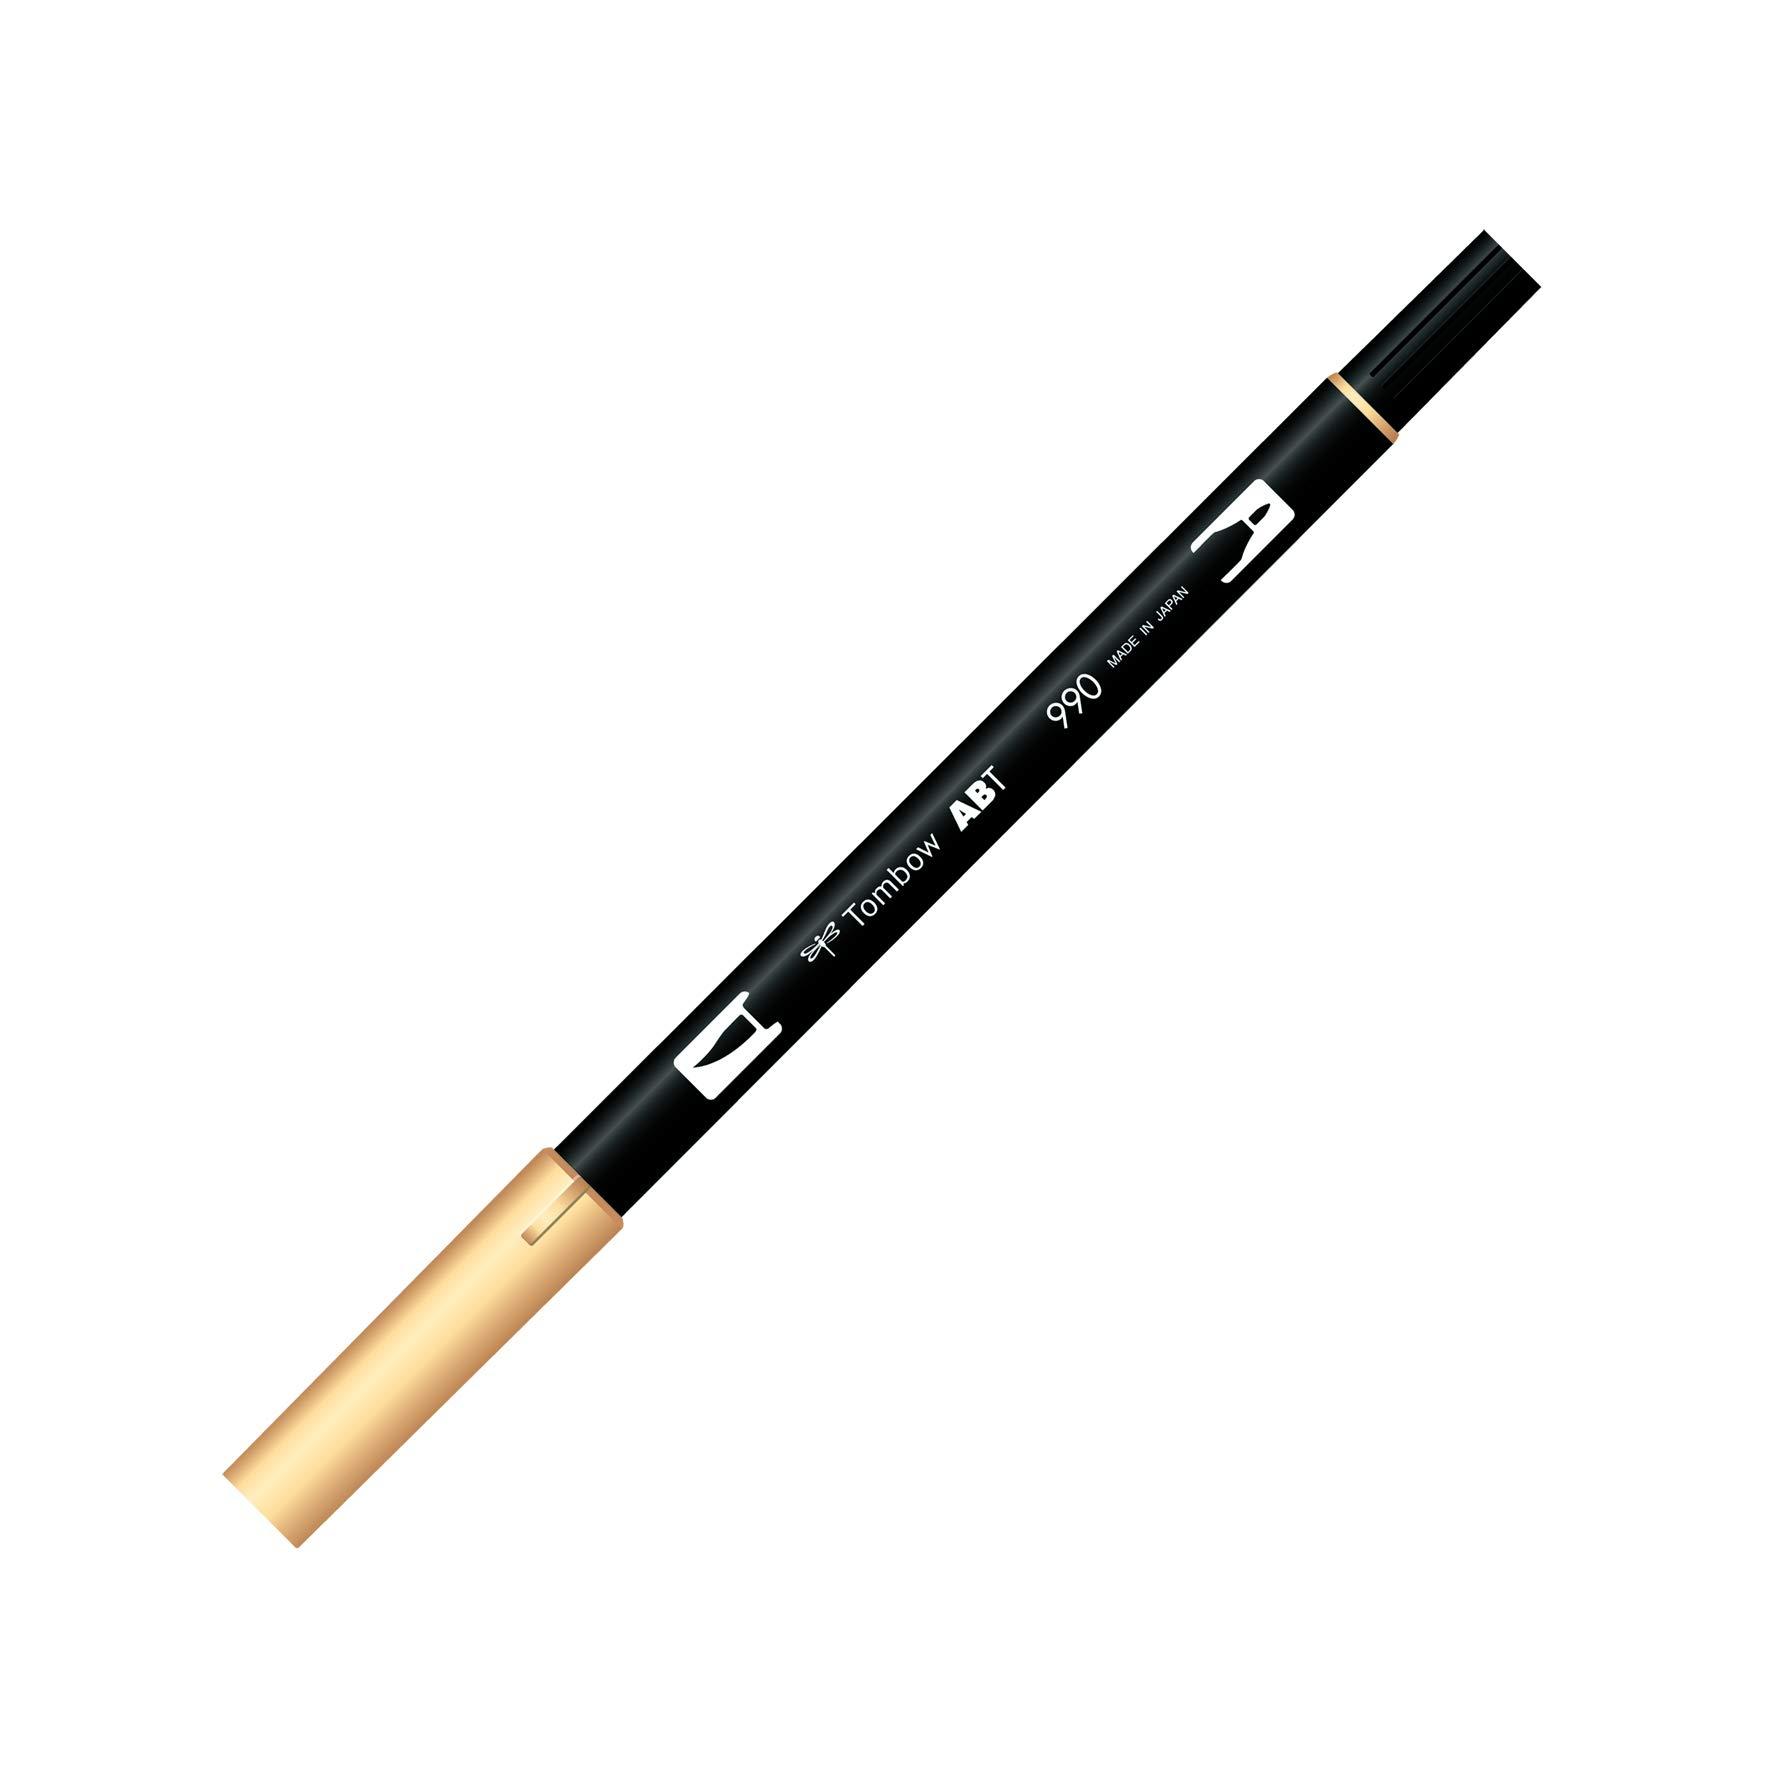 Tombow ABT 990 Dual Brush Pen - Light Sand